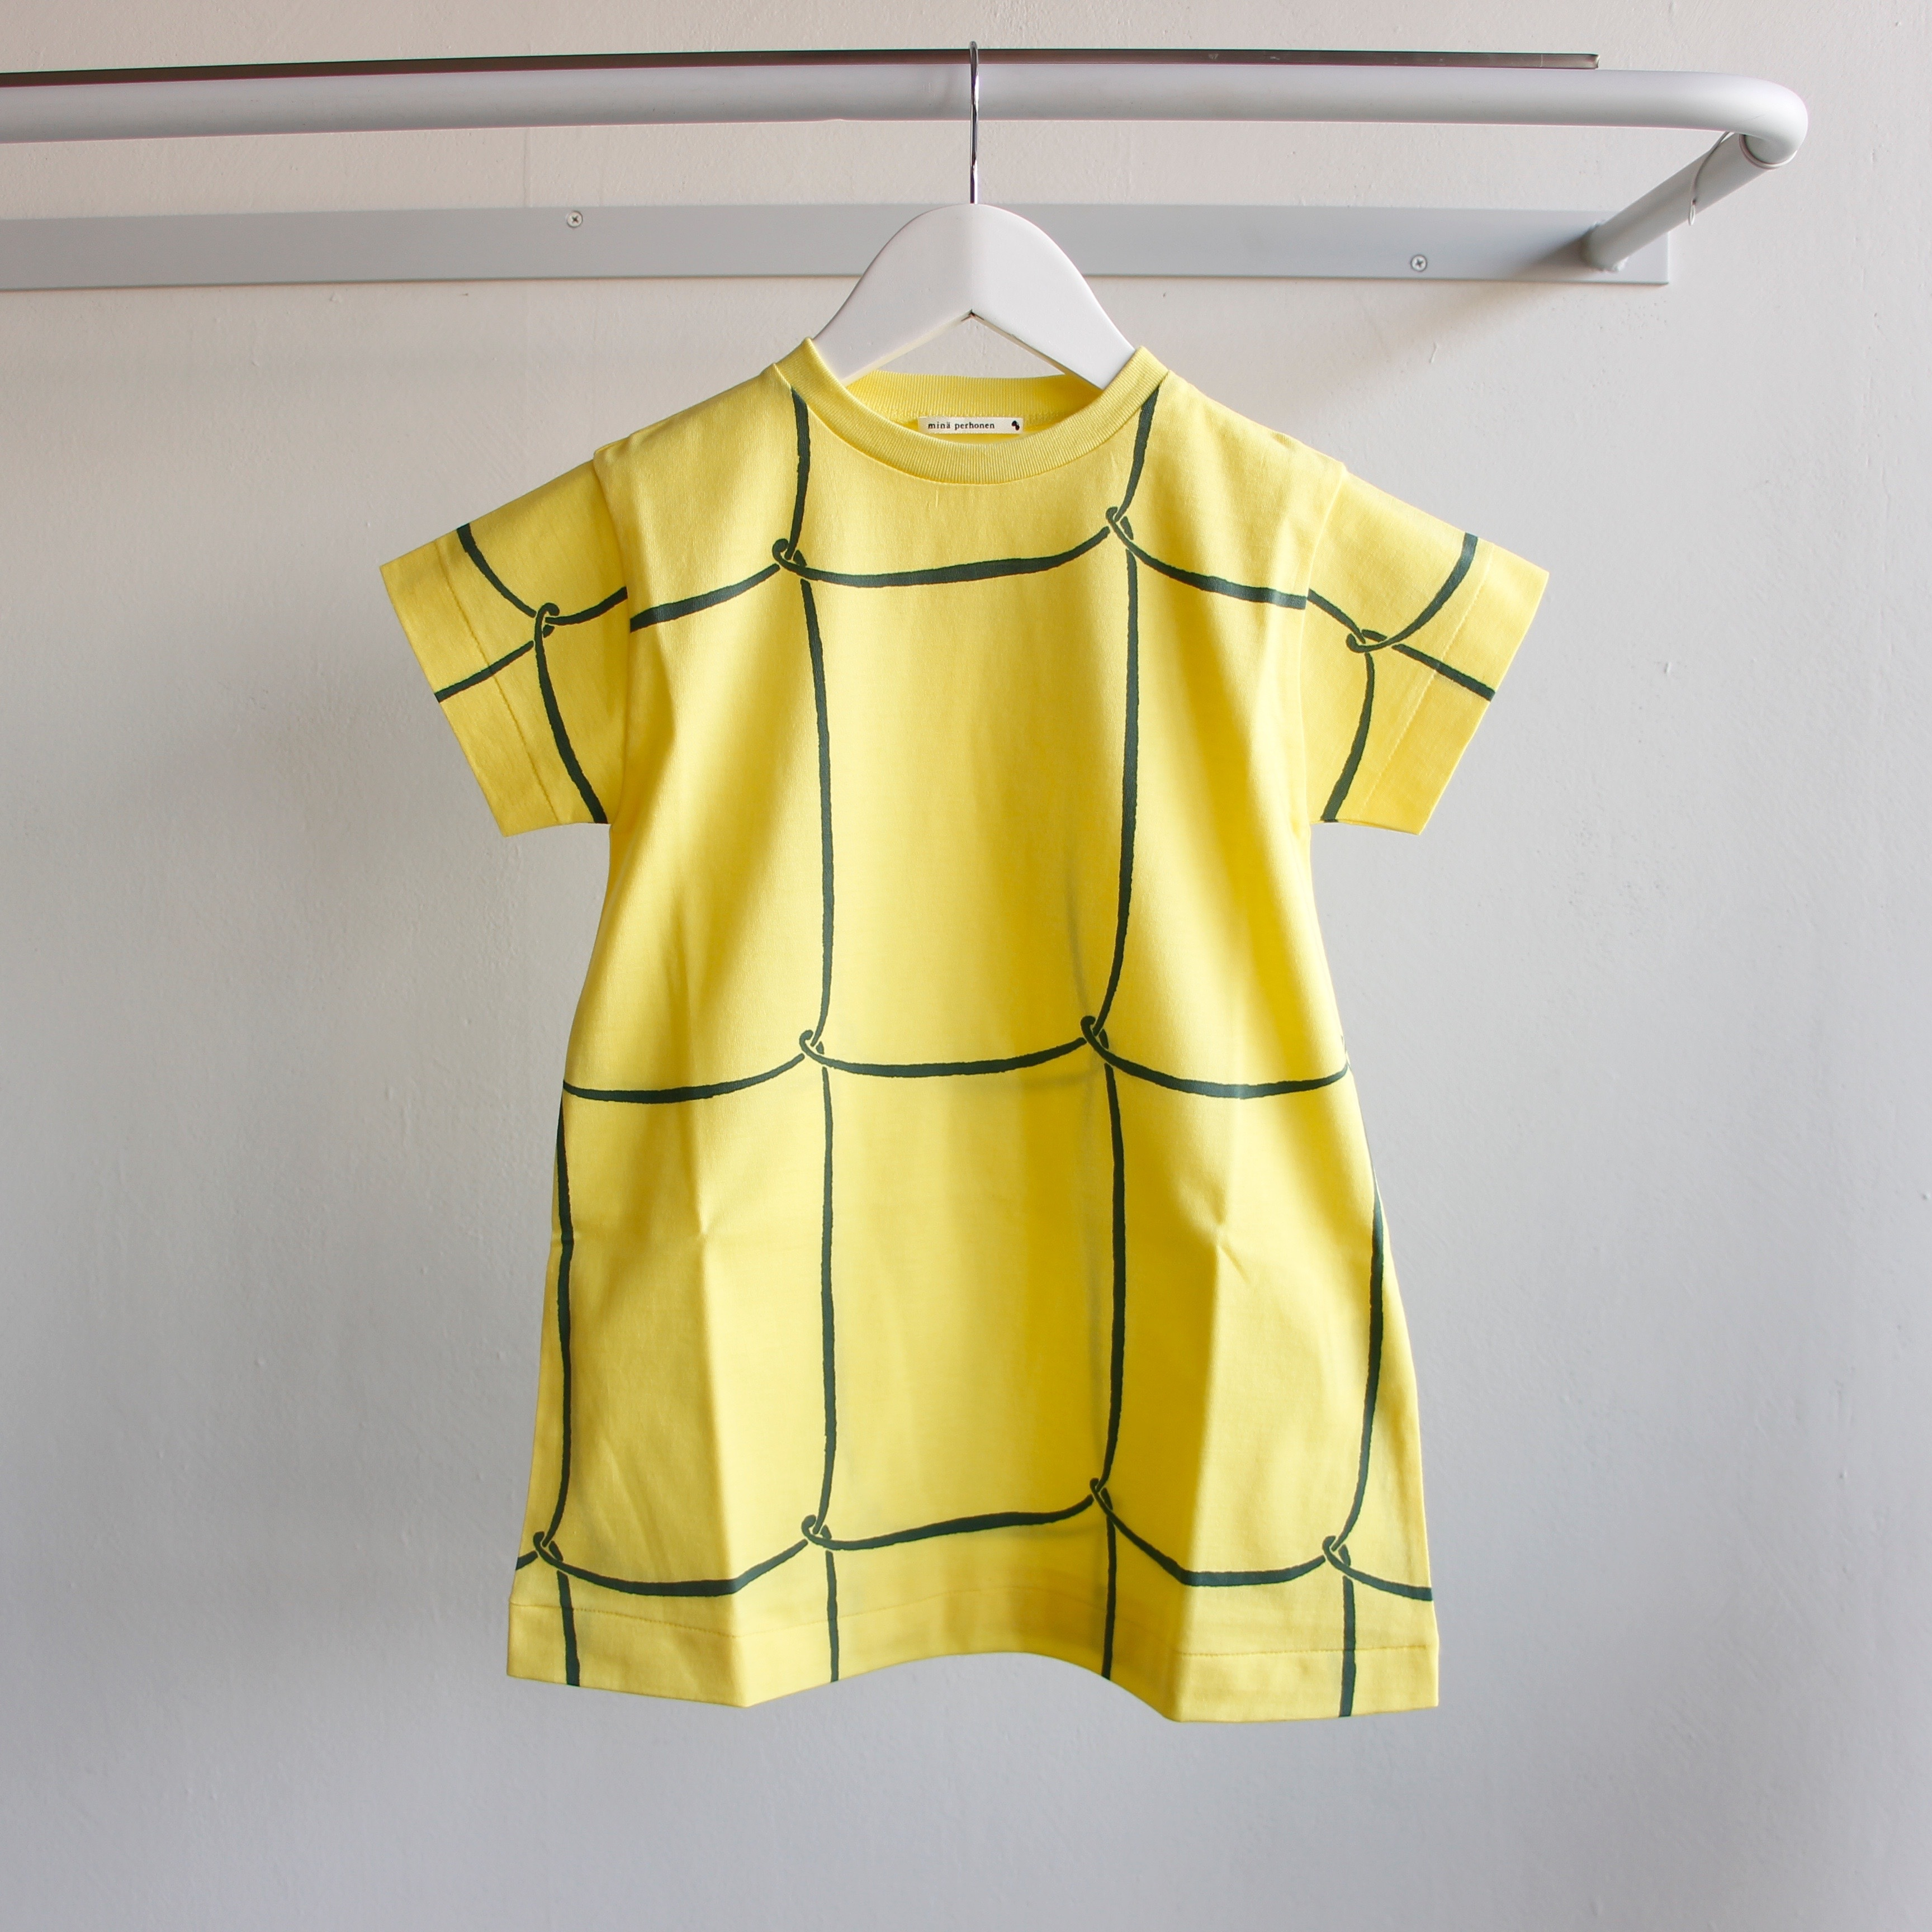 《mina perhonen 2018SS》ribbon frame ワンピース / yellow / 80-100cm